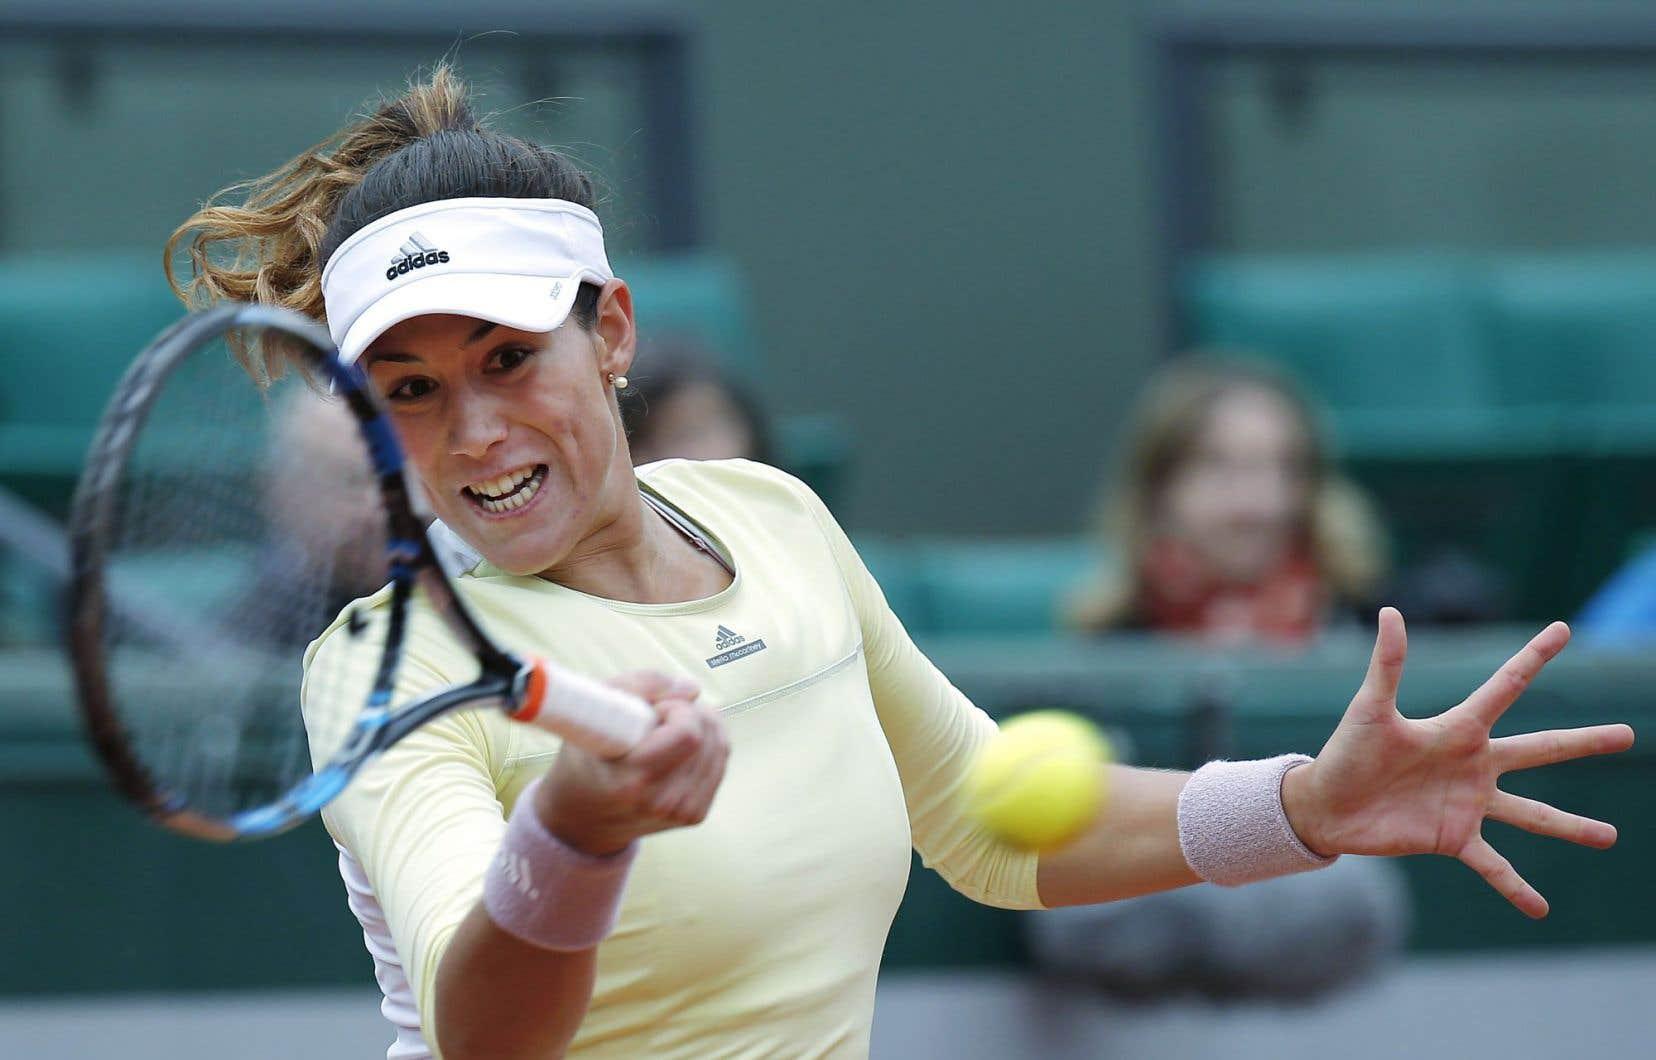 Garbine Muguruza affrontera Serena Williams, no 1 mondiale, en finale à Roland-Garros samedi.